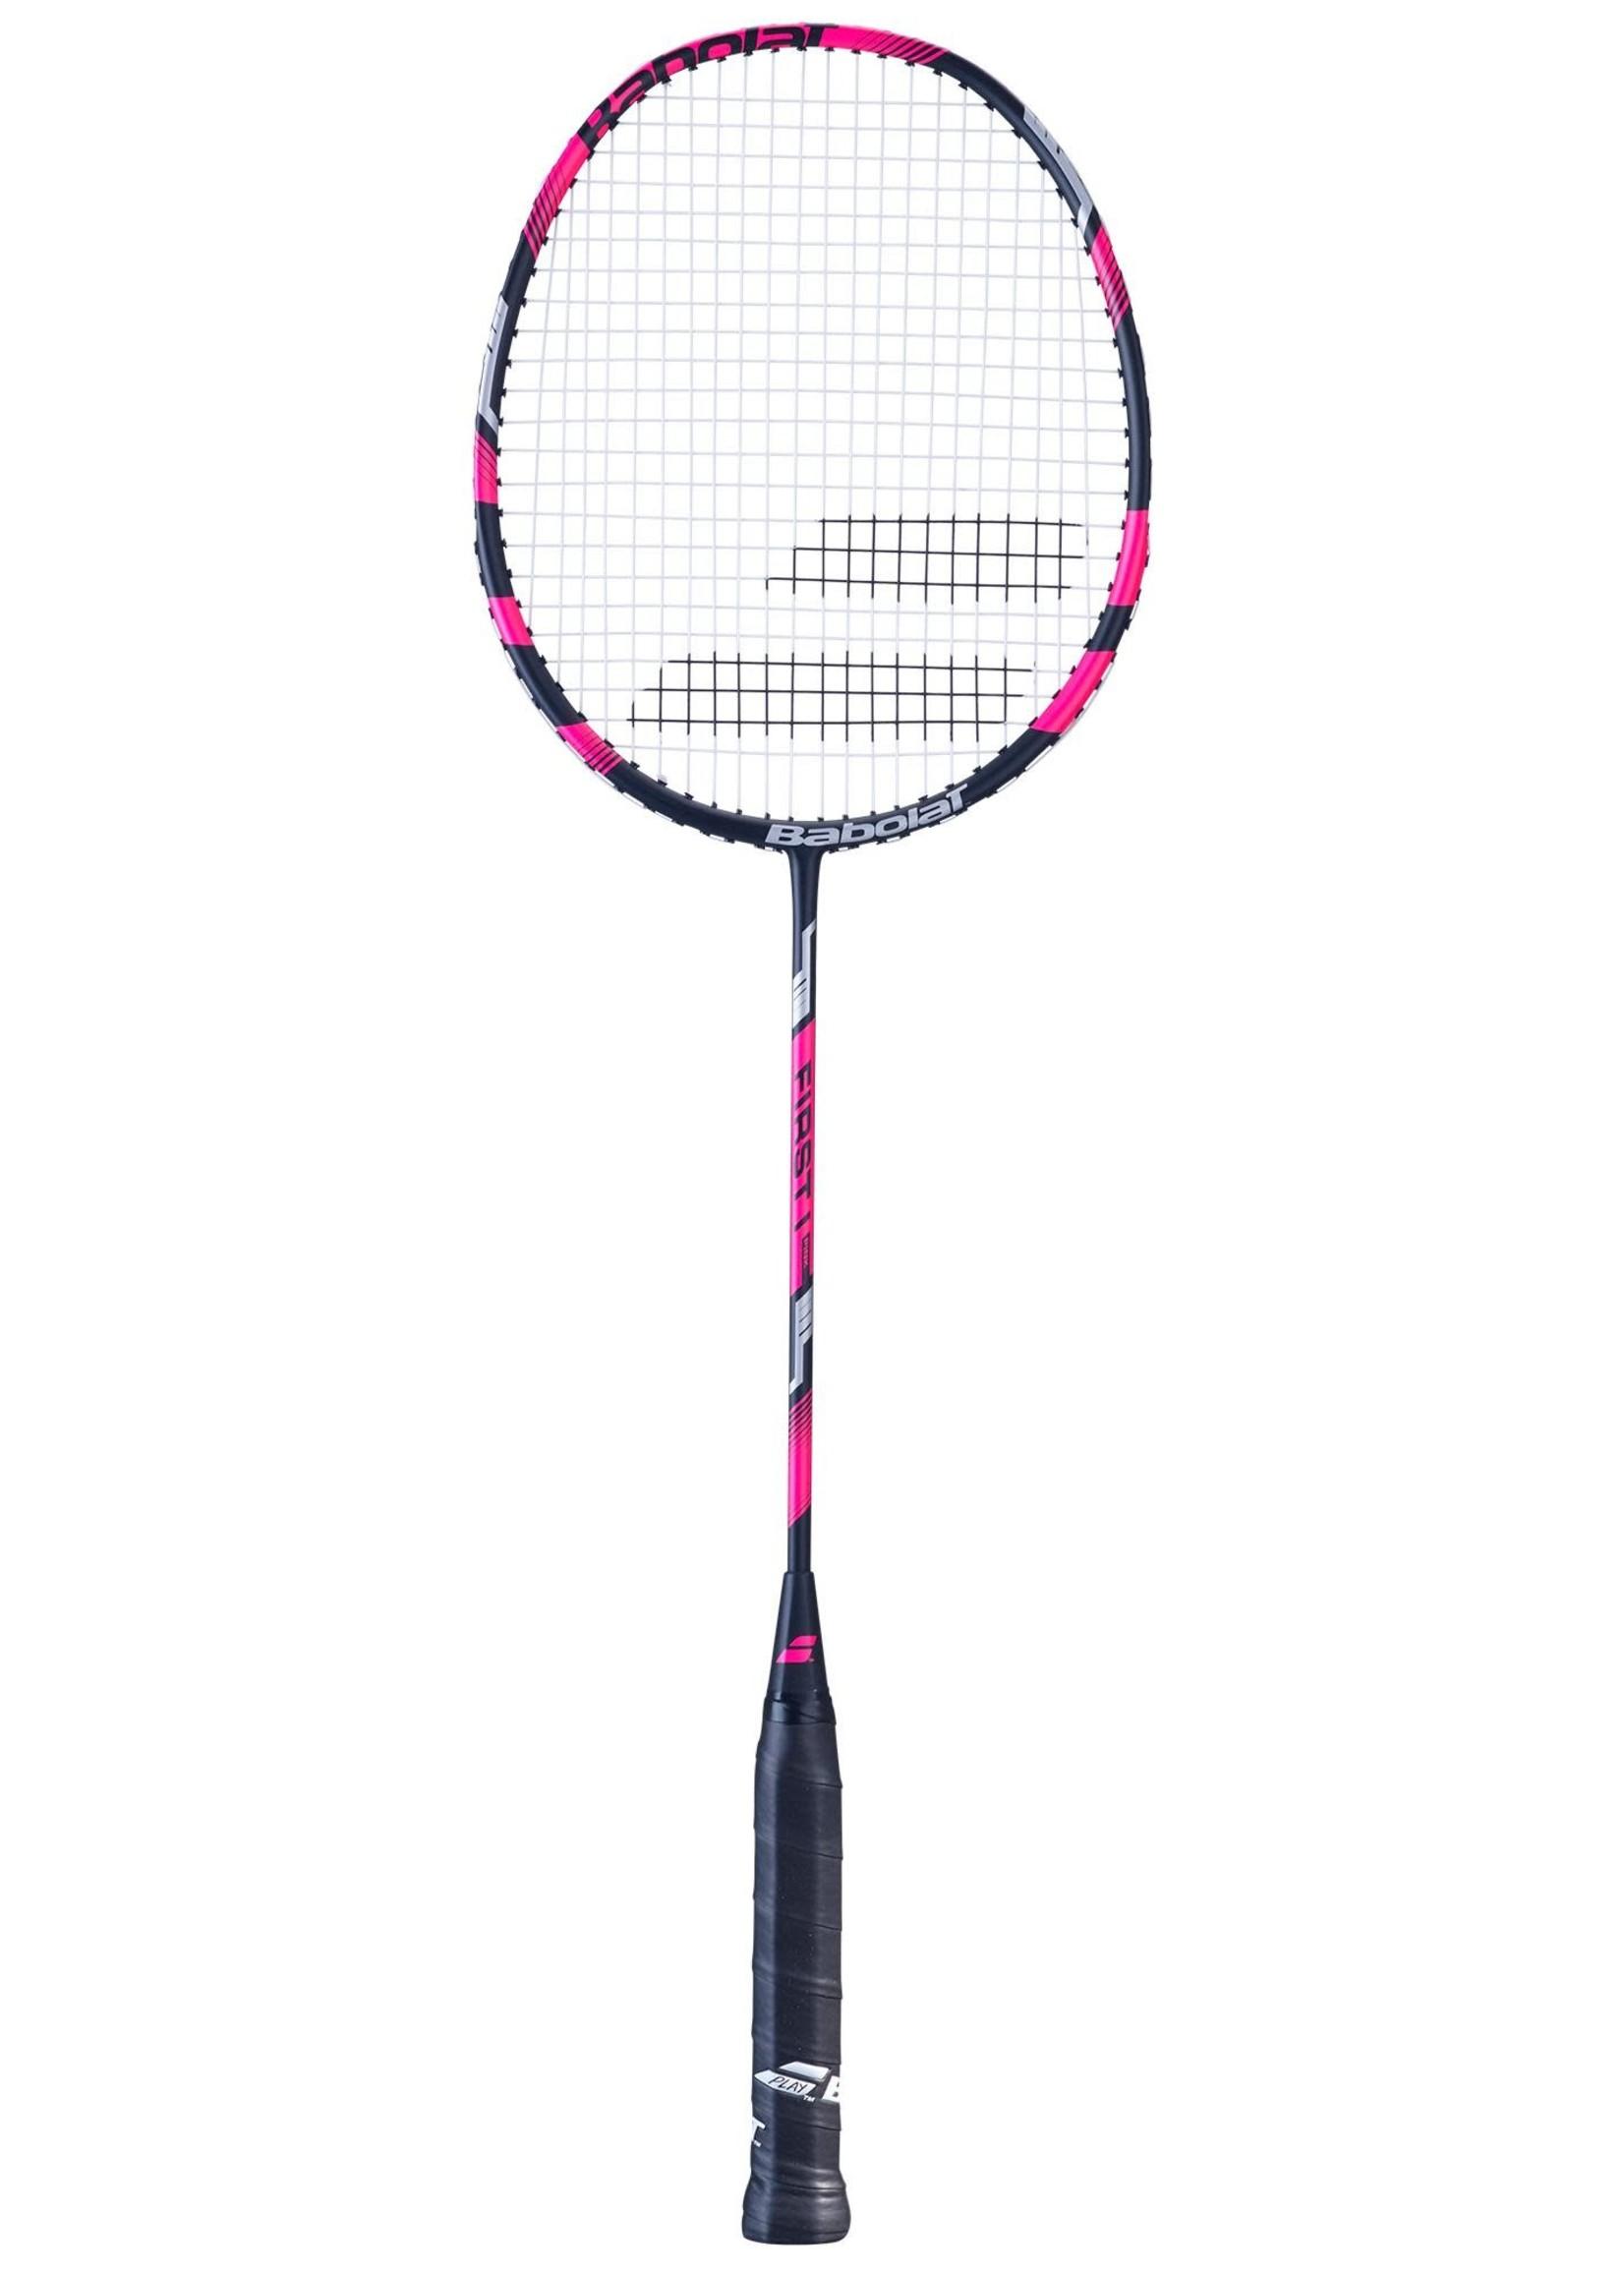 Babolat Babolat First I Badminton Racket (2021) Pink